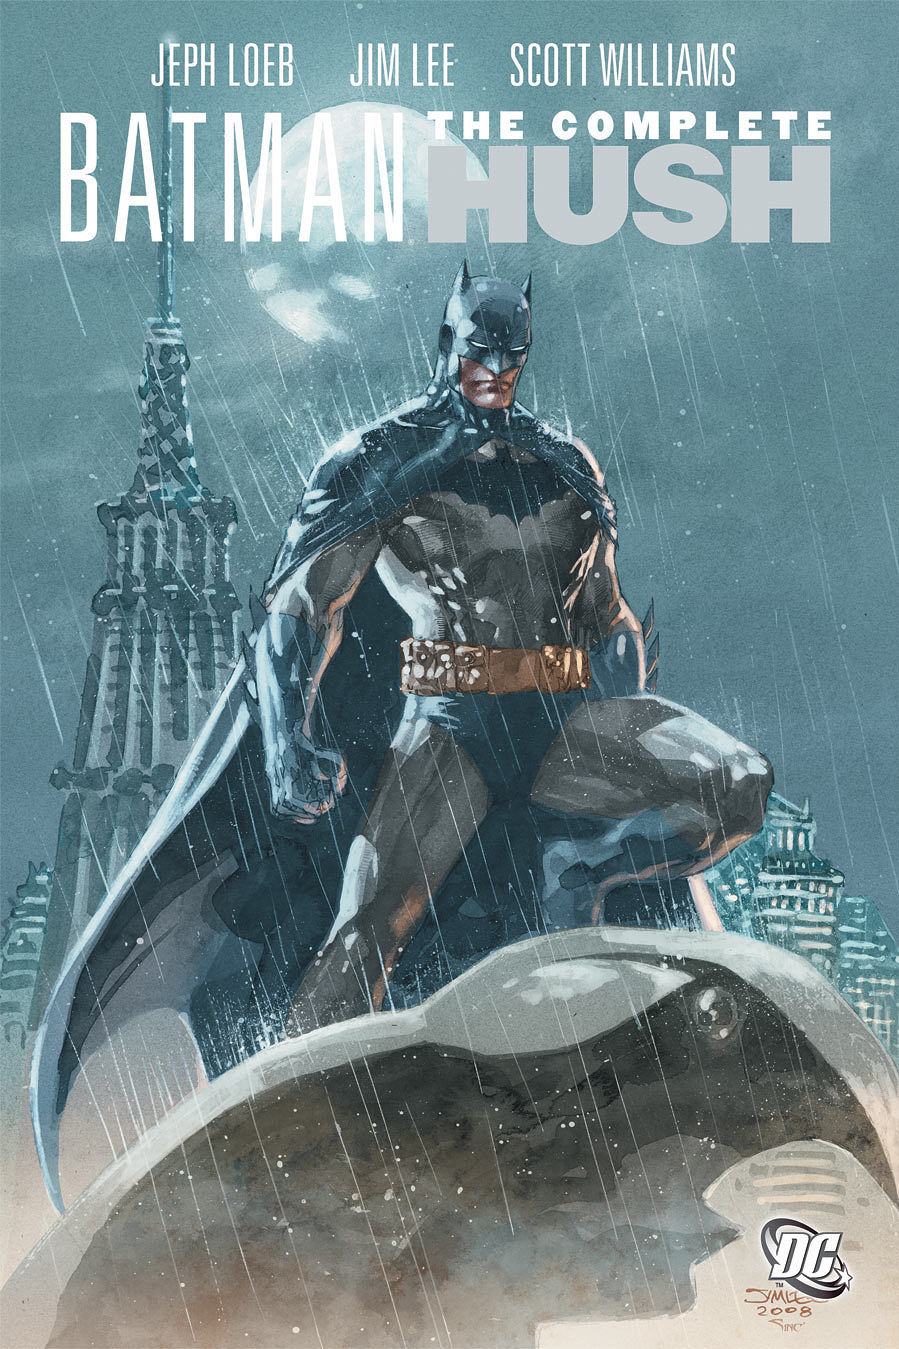 http://static.tvtropes.org/pmwiki/pub/images/bm_hush_ben_affleck_batman_trilogy_movie_1_of_3_batman_hush_of_the_red_hood_jpeg_45538_2.jpg